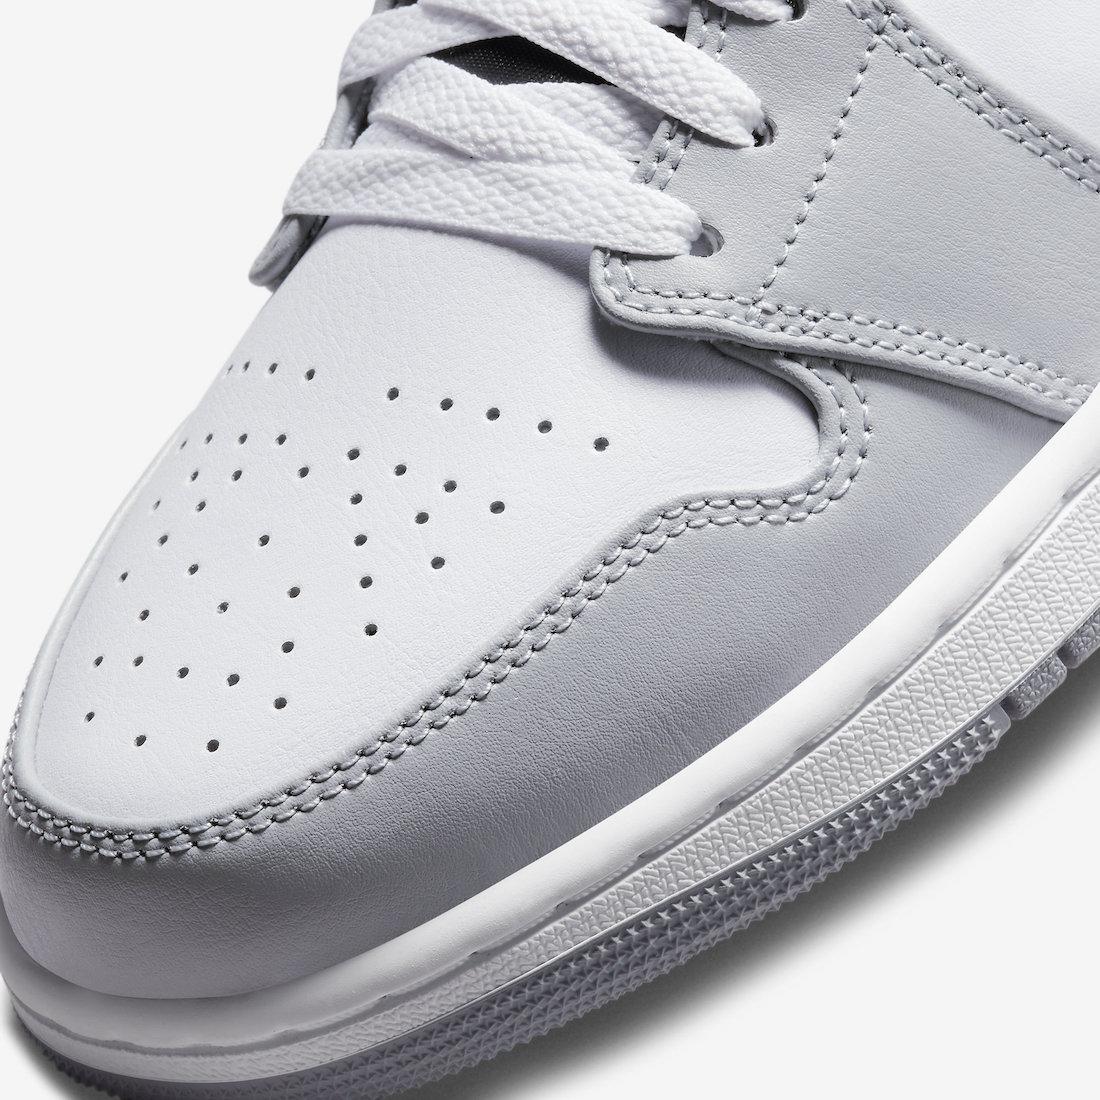 Swoosh, Smoke Grey, Light Smoke Grey, Jordan, Air Jordan 1 Mid, Air Jordan 1, Air Jordan